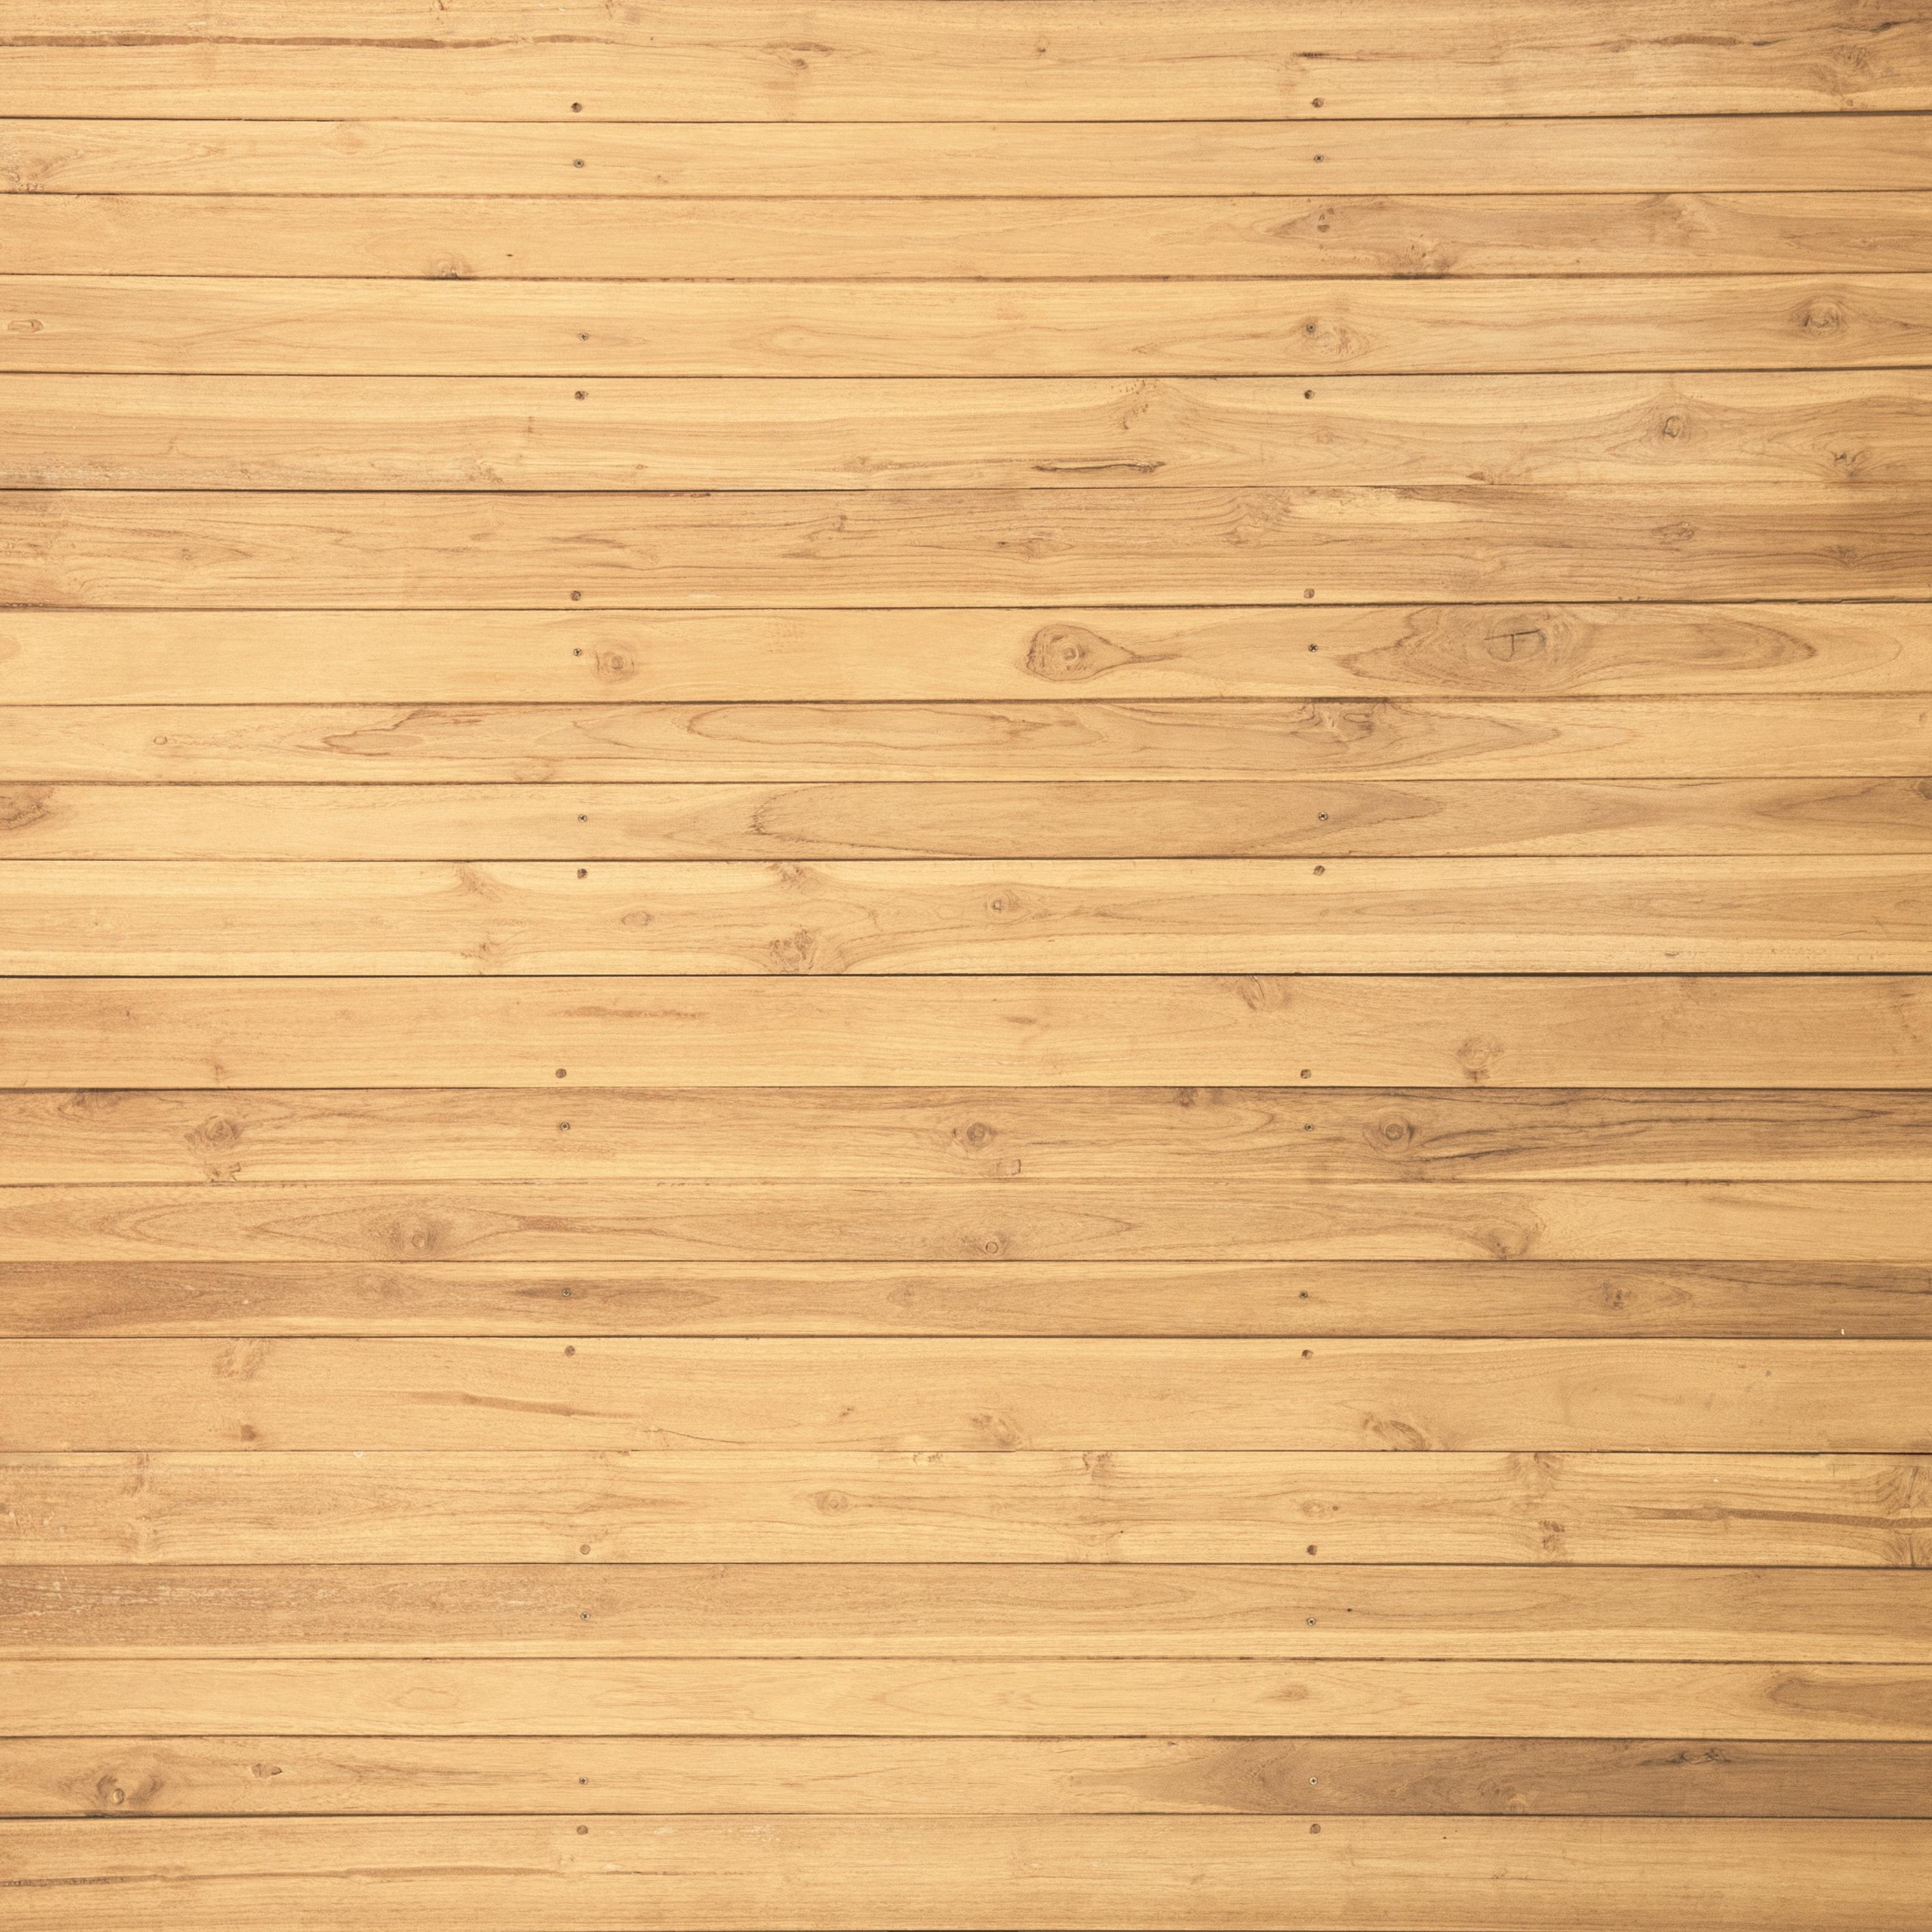 wood images pexels free stock photos